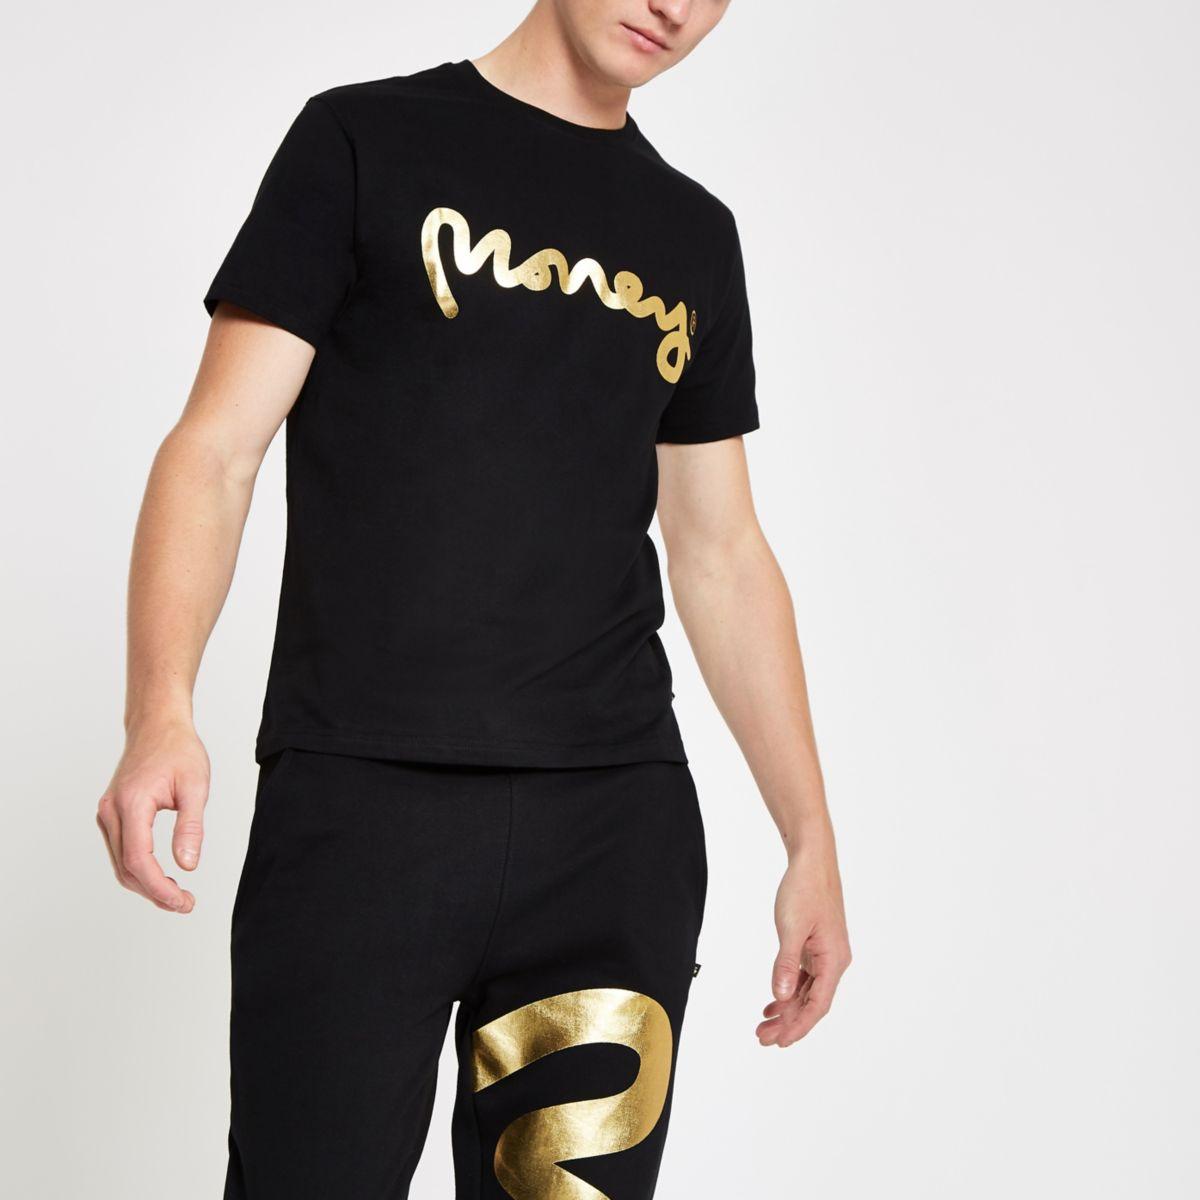 Money Clothing black logo T-shirt